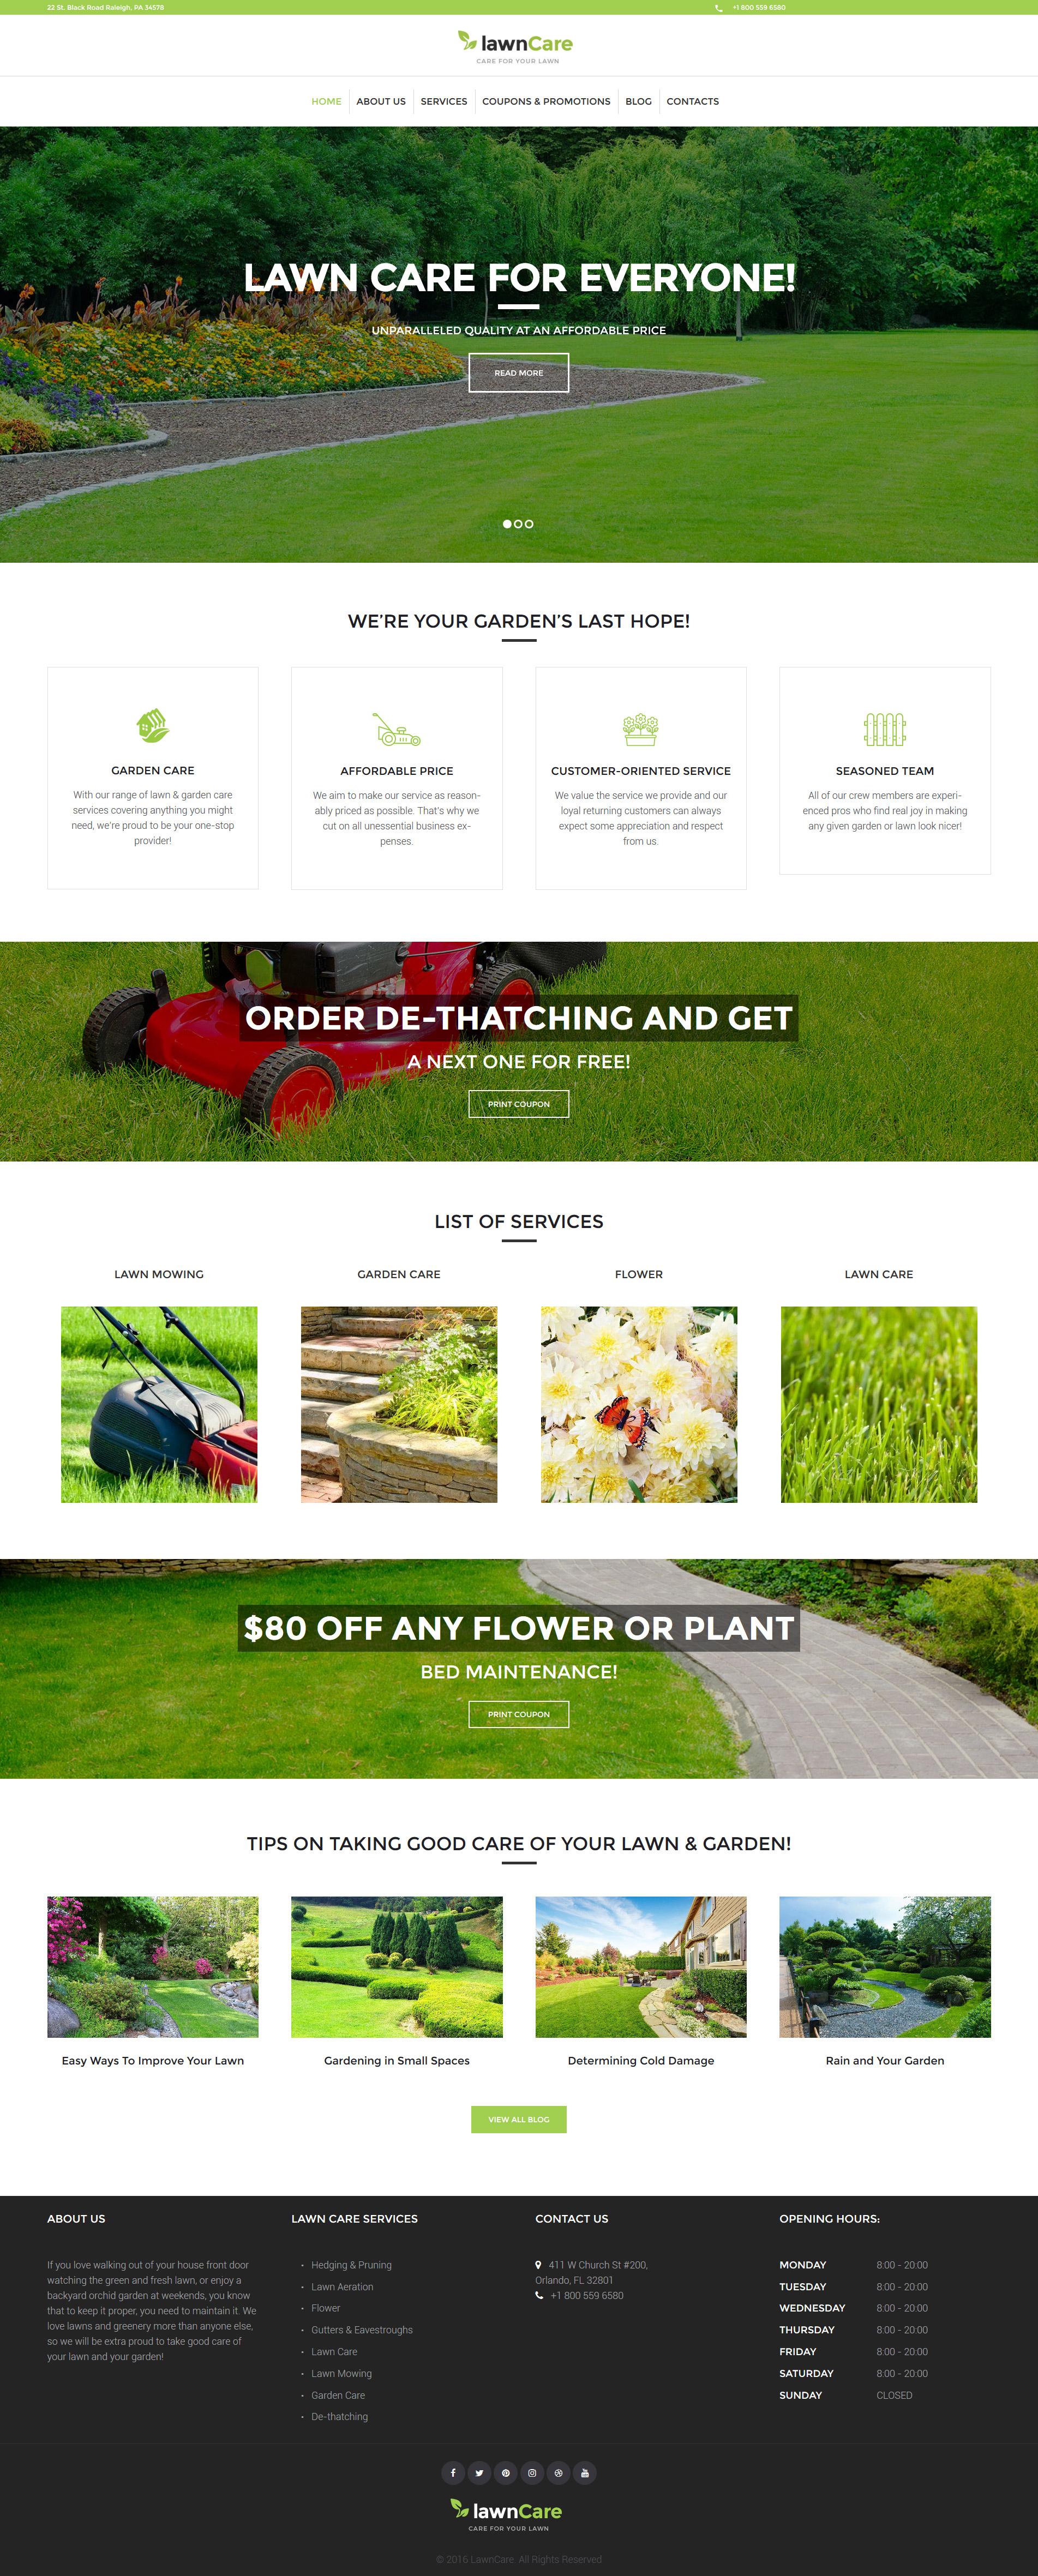 Lawn Care на тему ландшафтный дизайн №62024 - скриншот